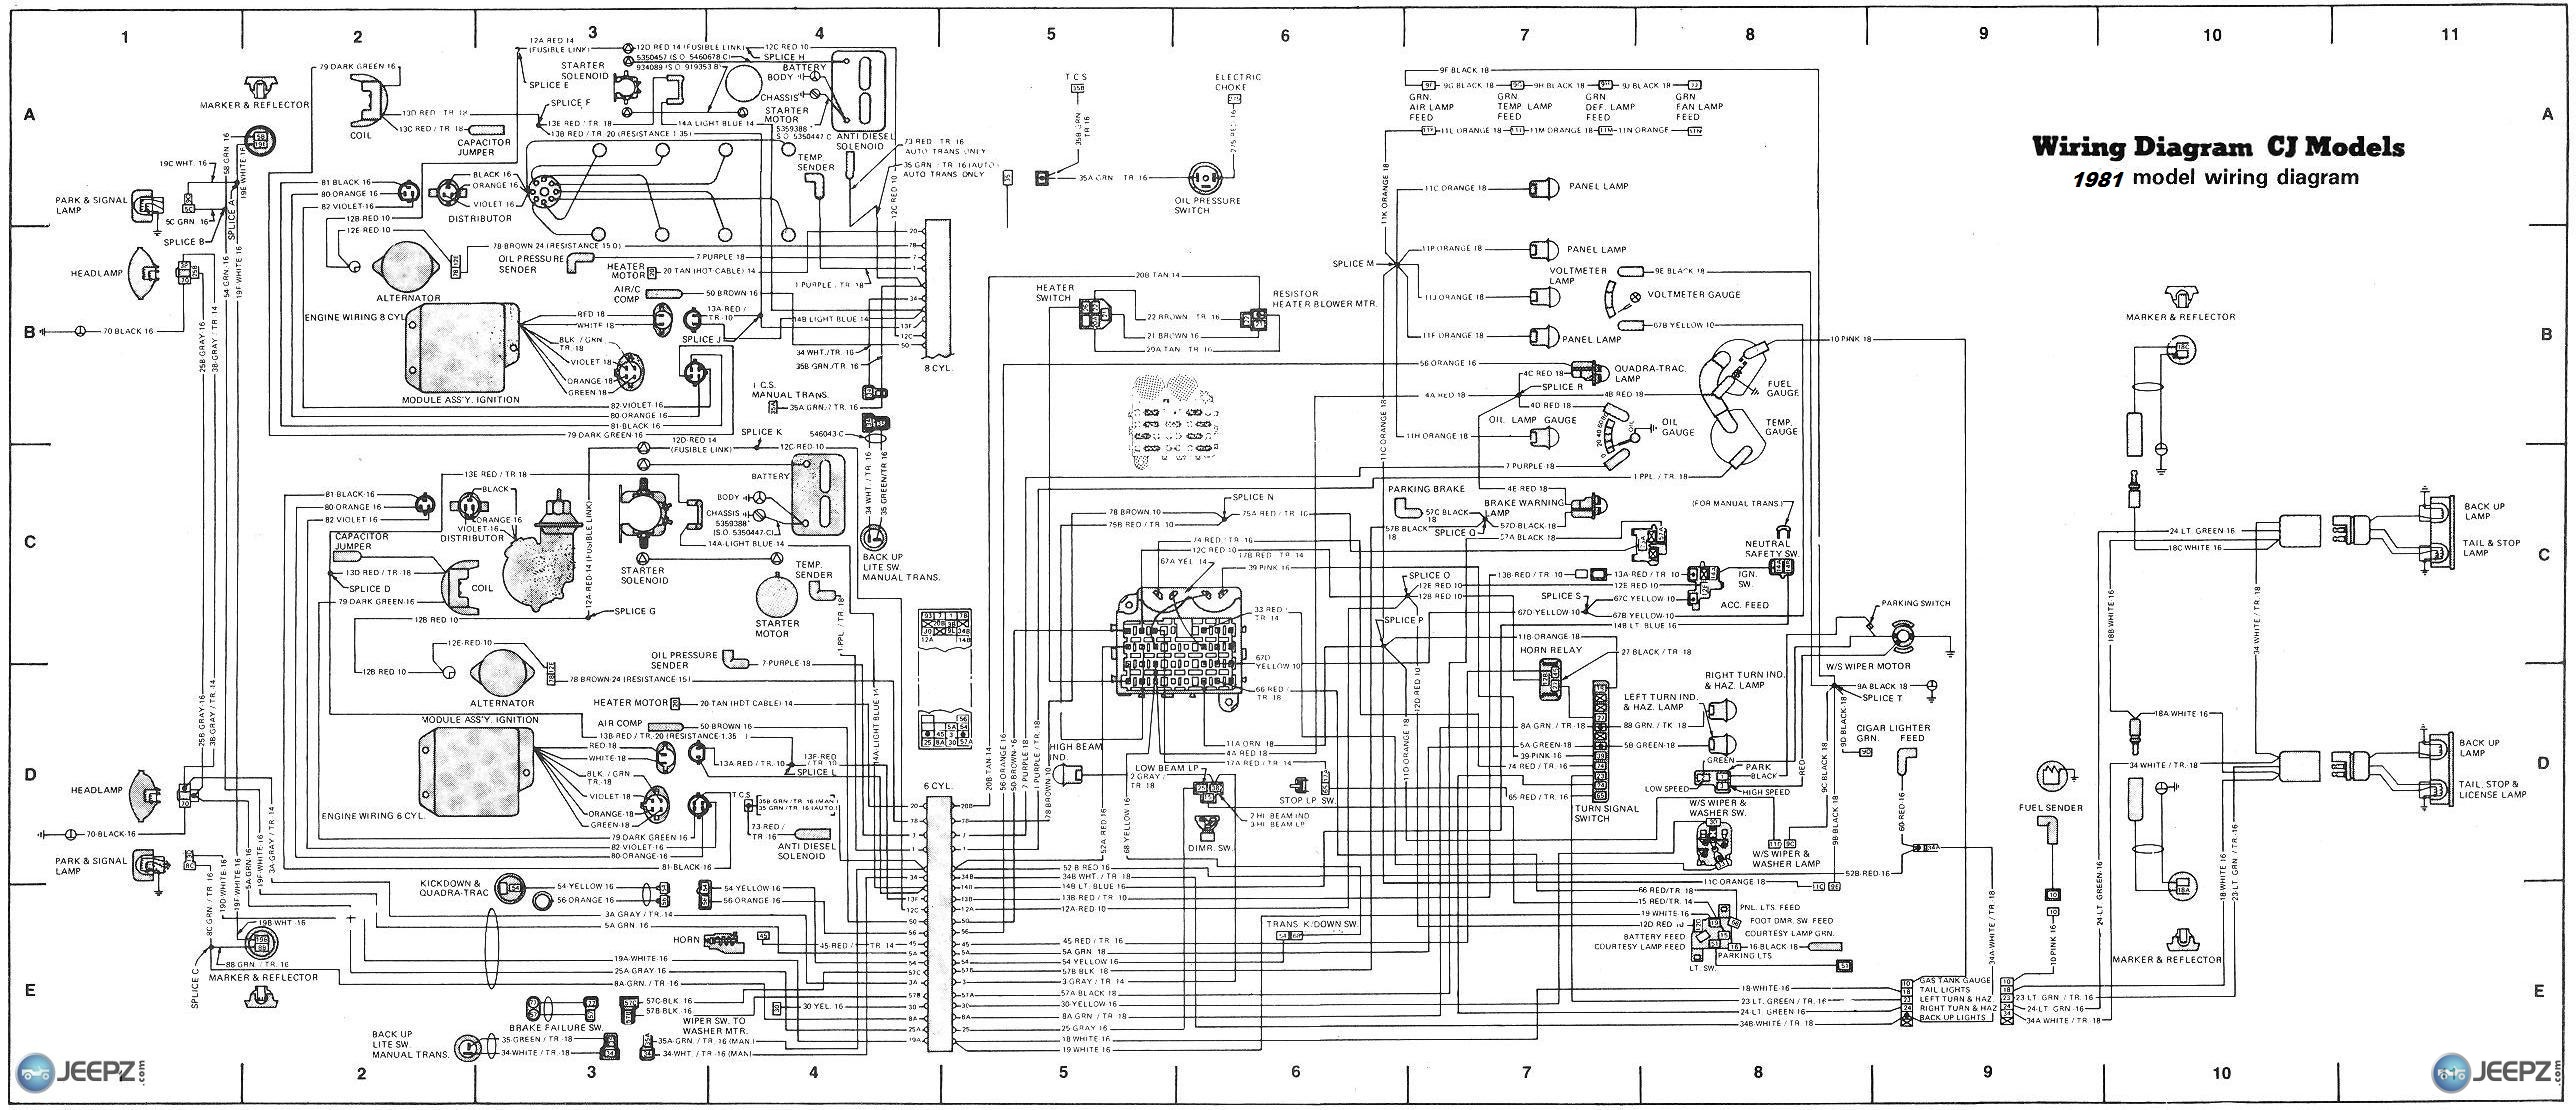 jeep cj wiring schematic wiring diagrams lol 83 CJ7 Coil Wiring Diagram 1981 jeep cj7 wiring schematic wiring diagram read toyota tundra wiring schematic 1985 jeep cj wiring